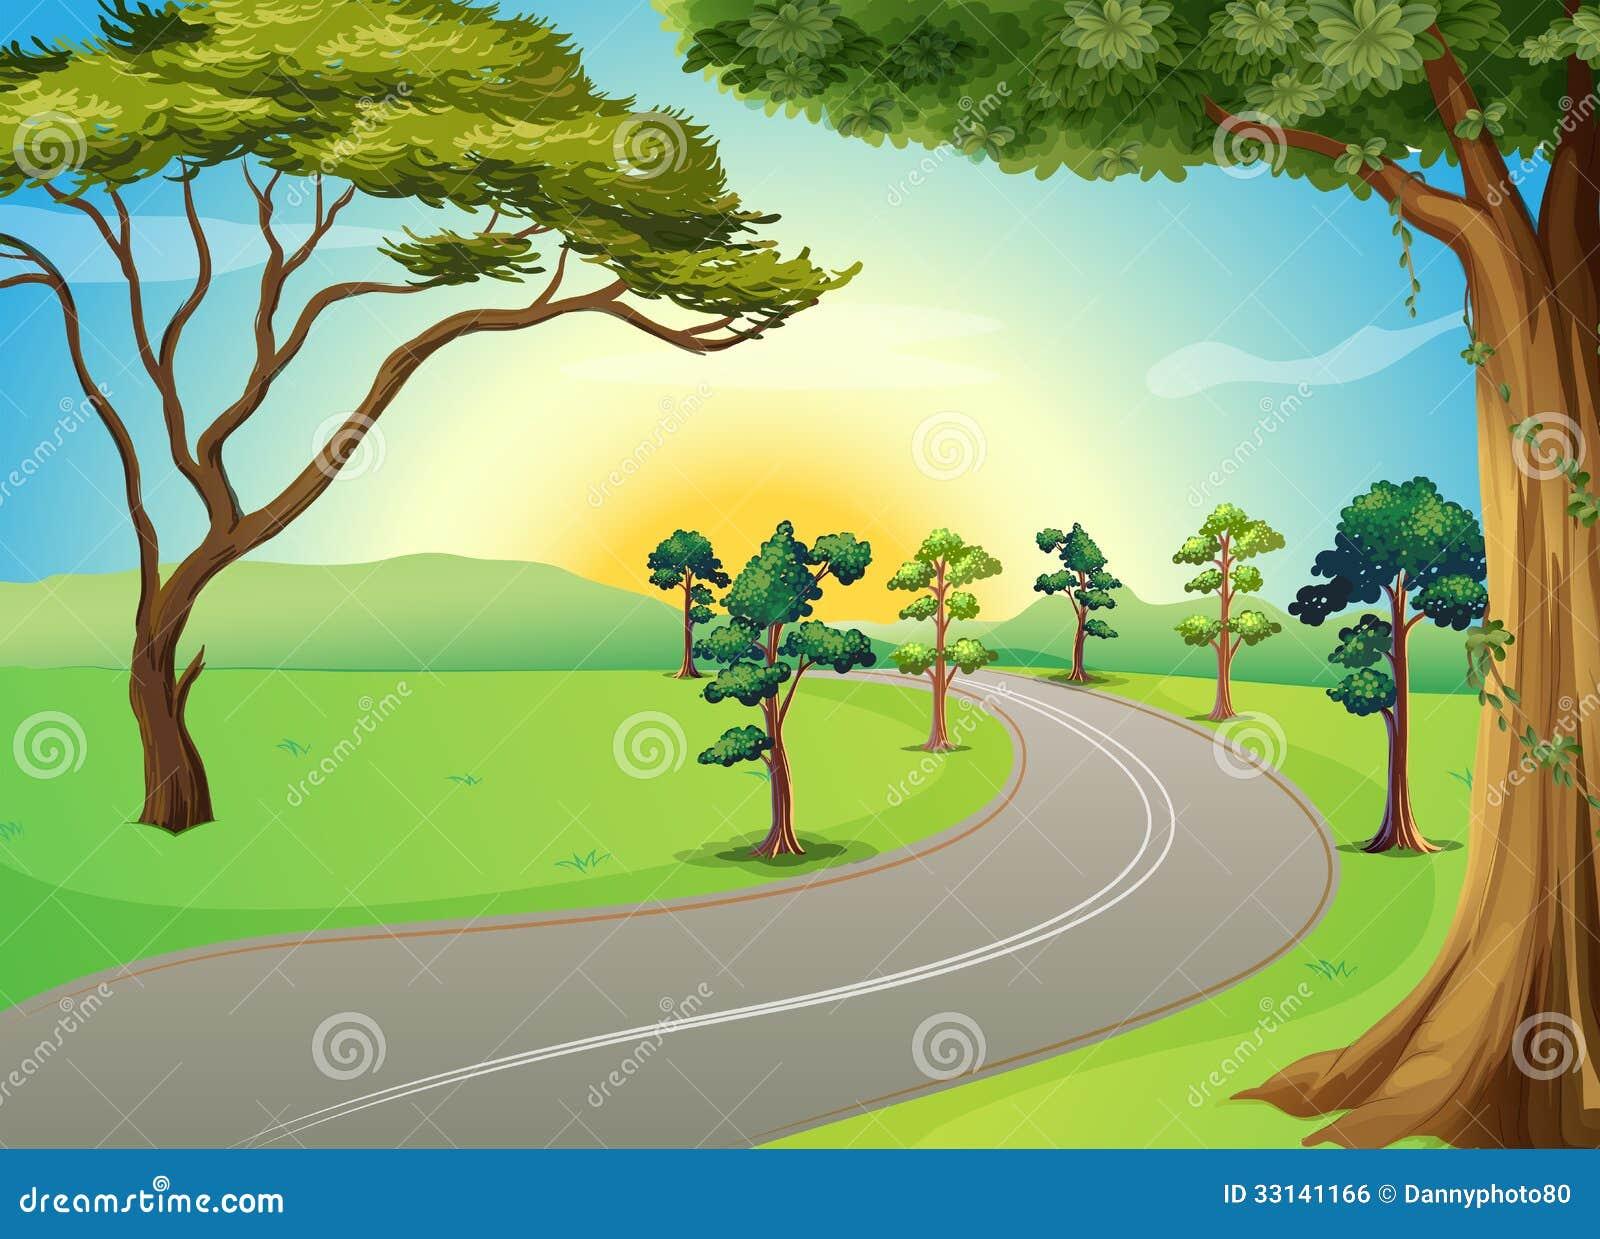 Winding Path Illustration A Long Winding Road At...